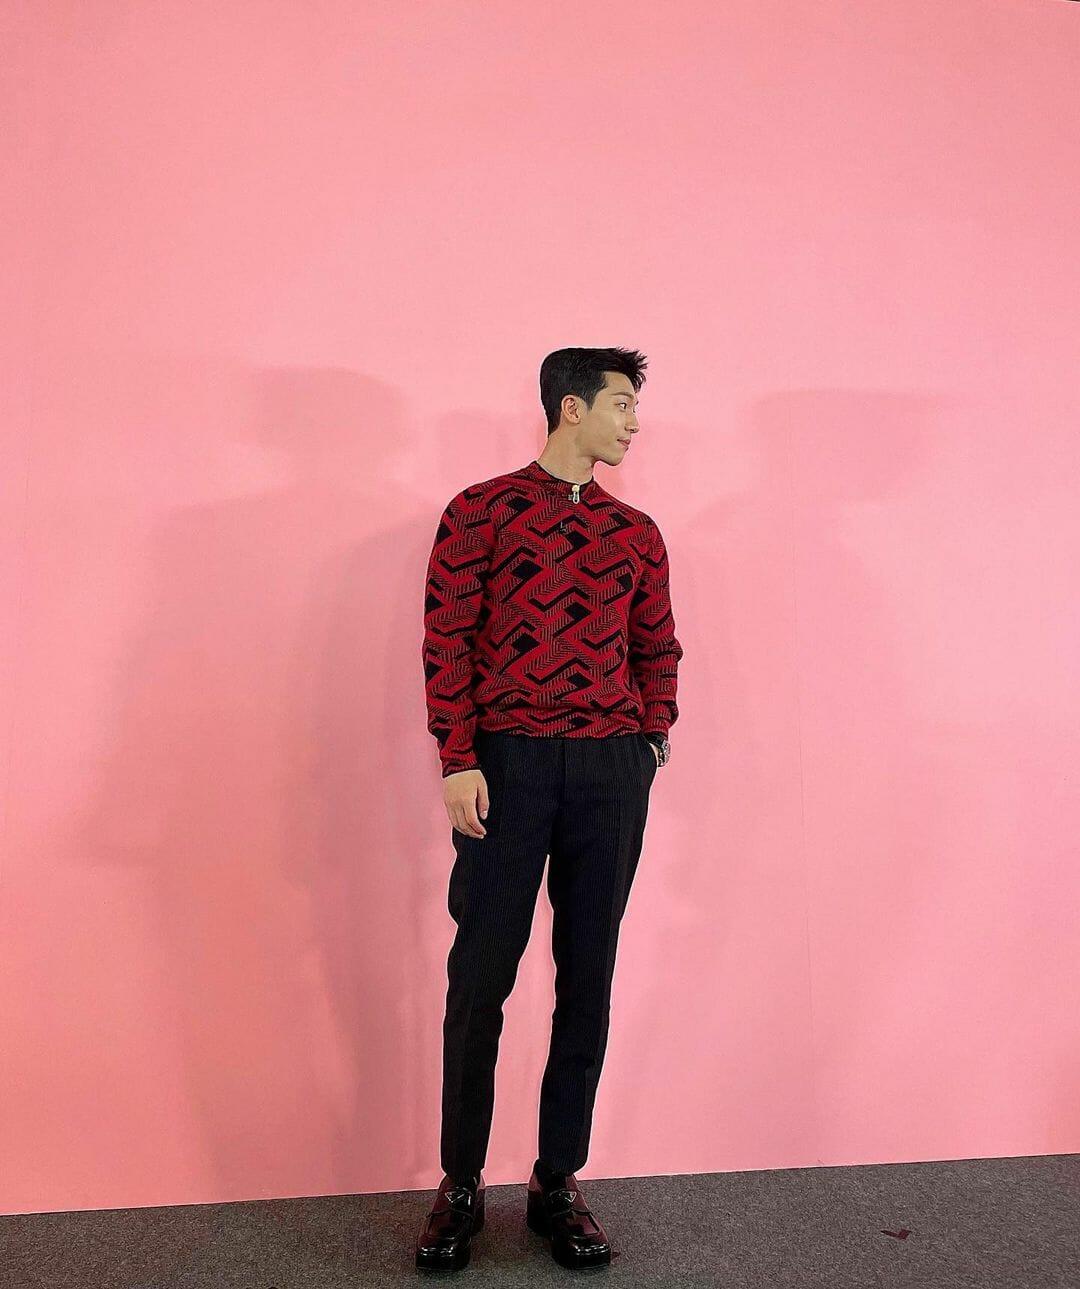 #ManCrushMonday — Wi Ha Jun Experiments With a Retro Graphic Sweater